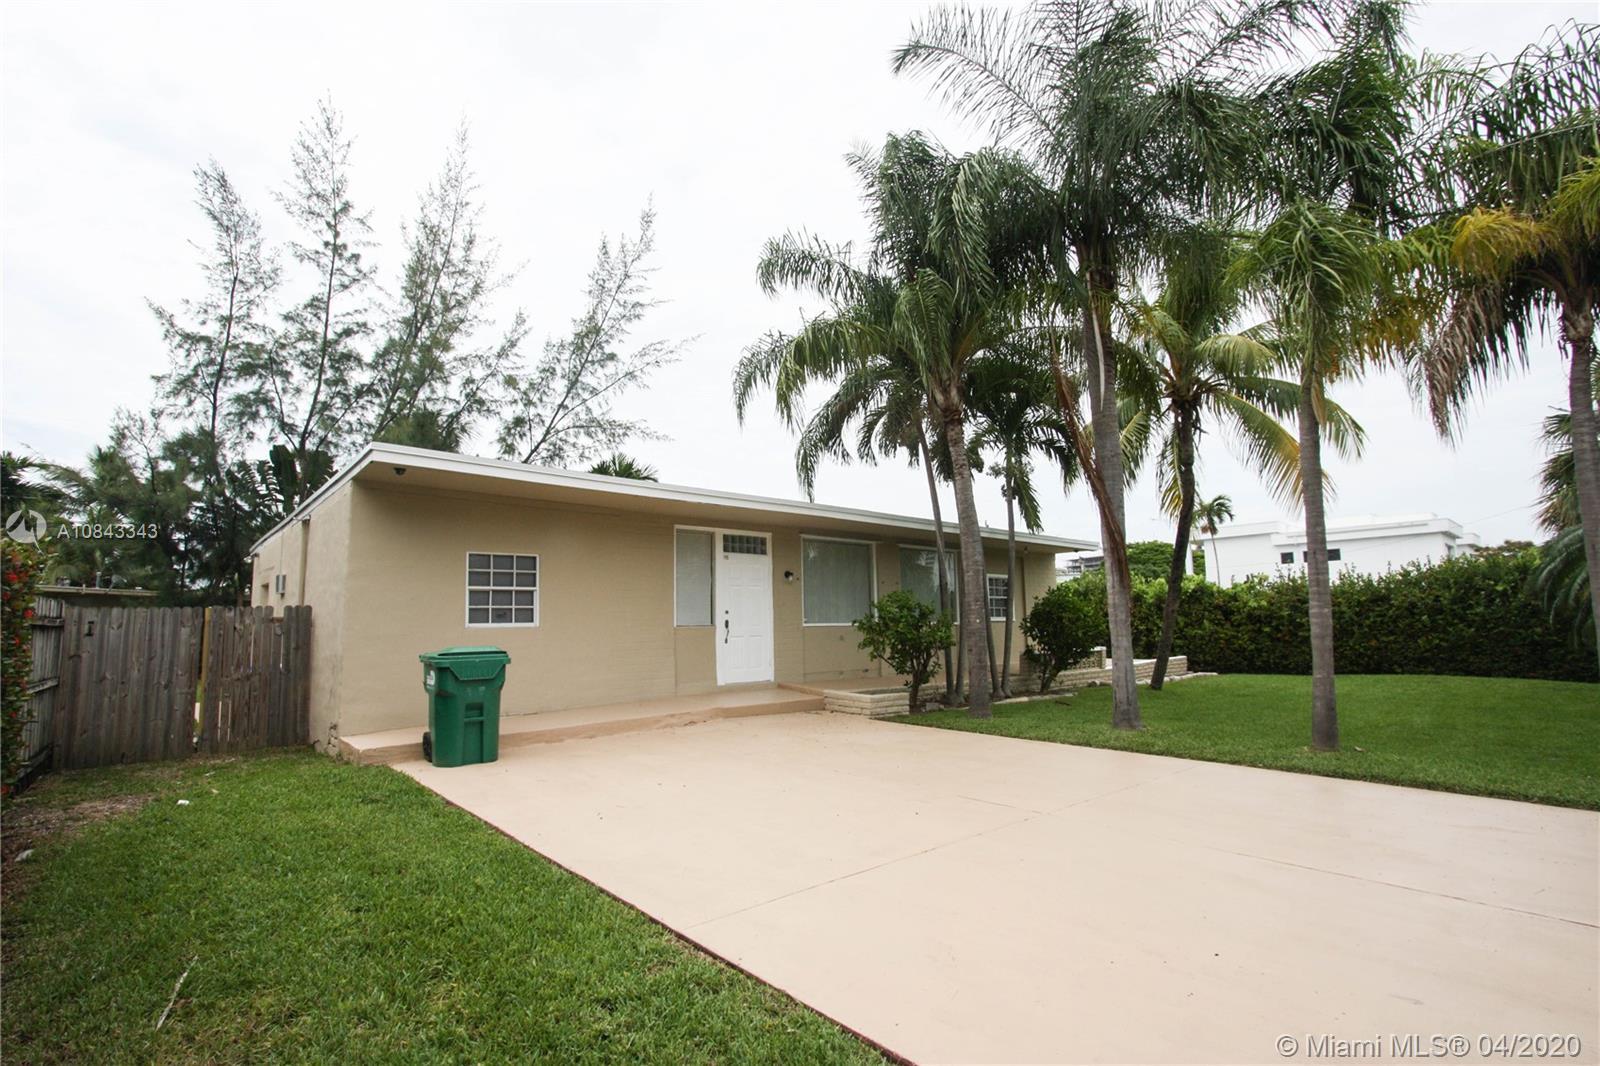 332 189th St, Sunny Isles Beach, Florida